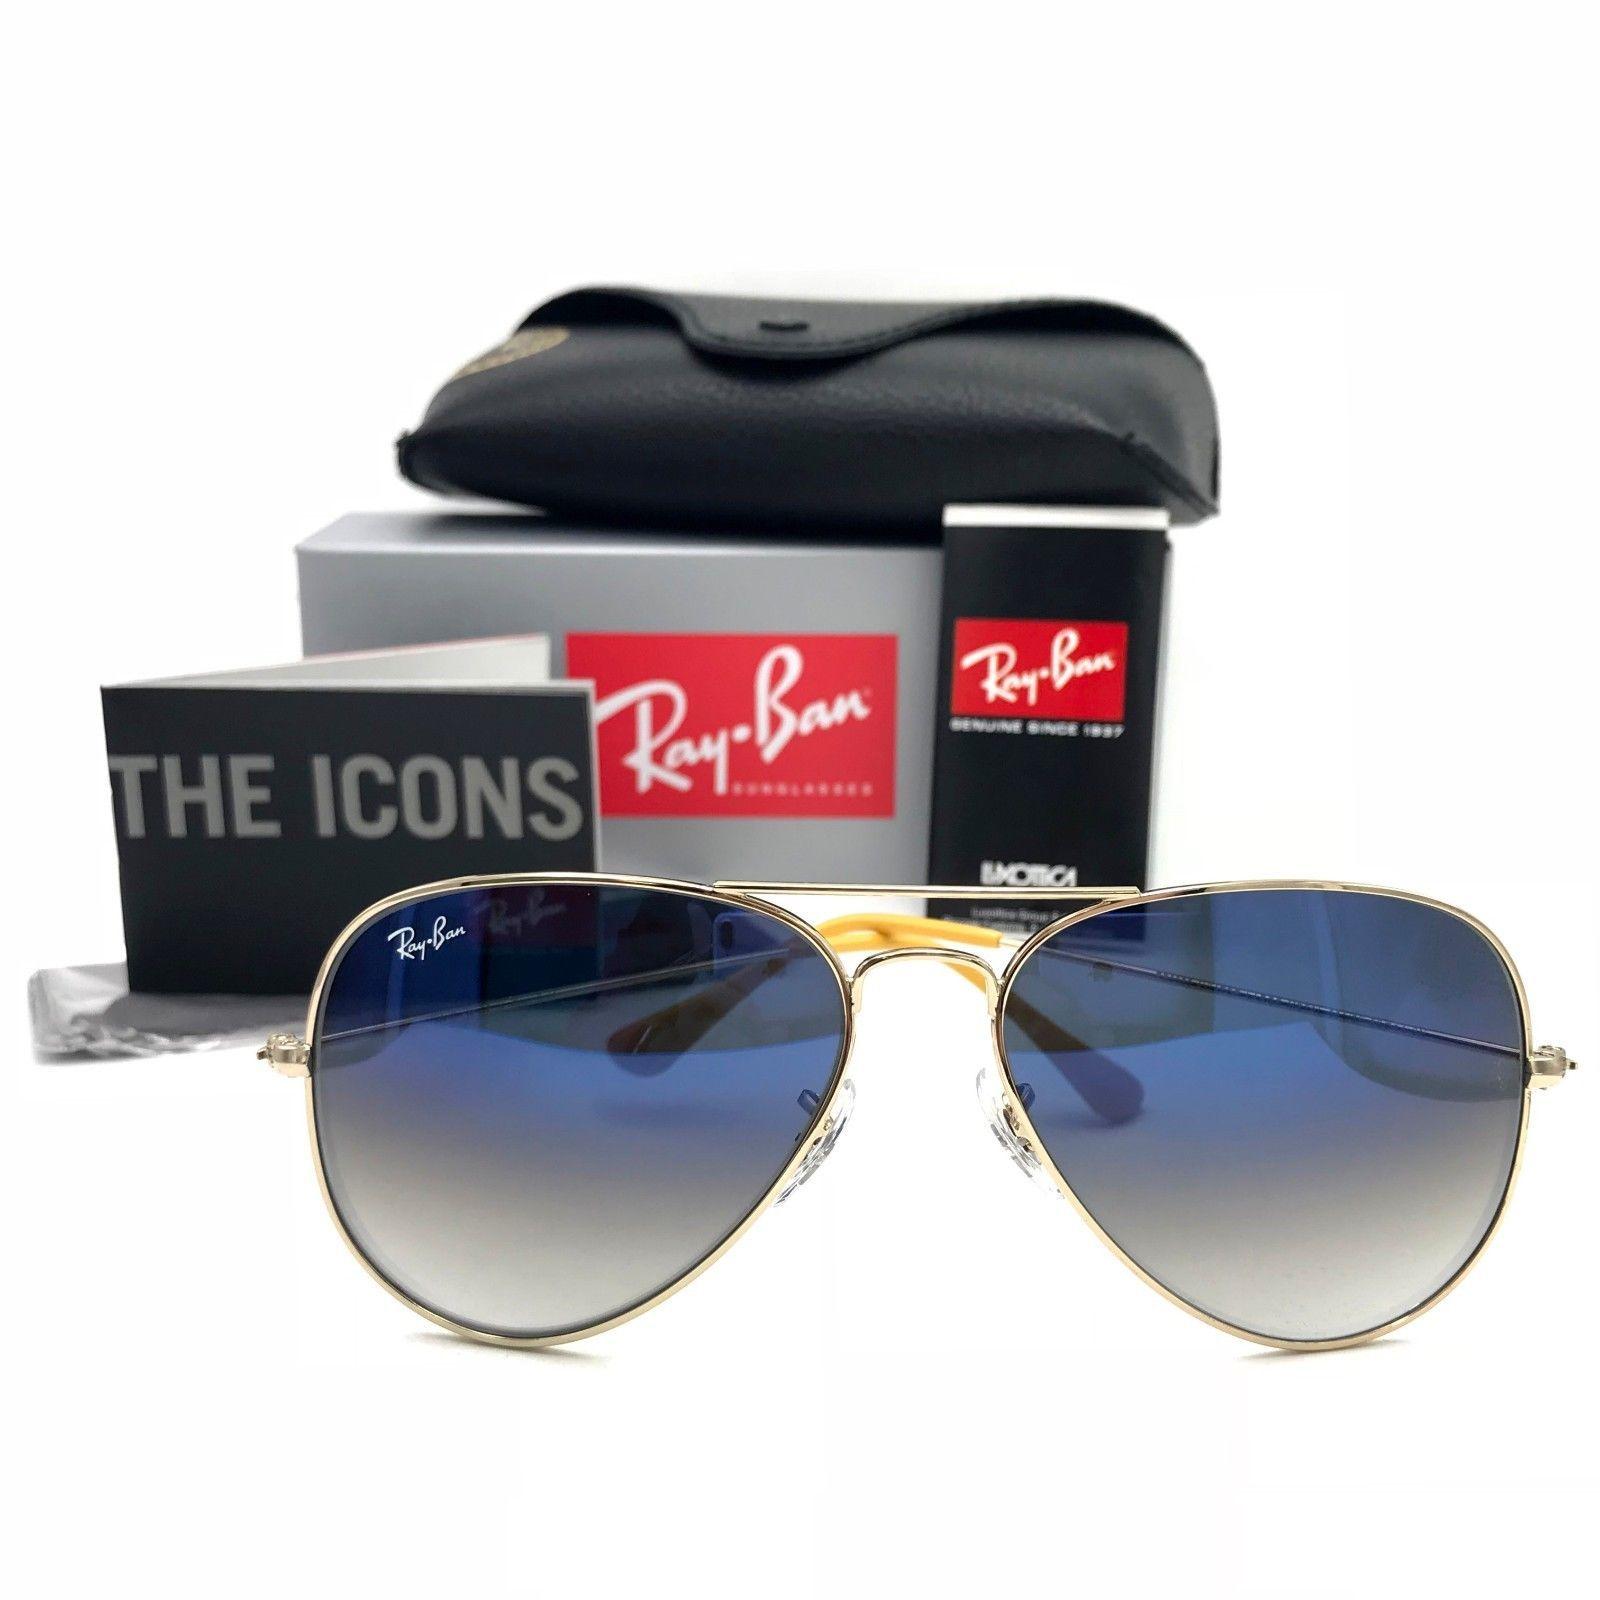 b15e734c55ed New Ray-Ban RB3025 001 3F Gold Aviator Sunglasses w  Gradient Blue Lenses